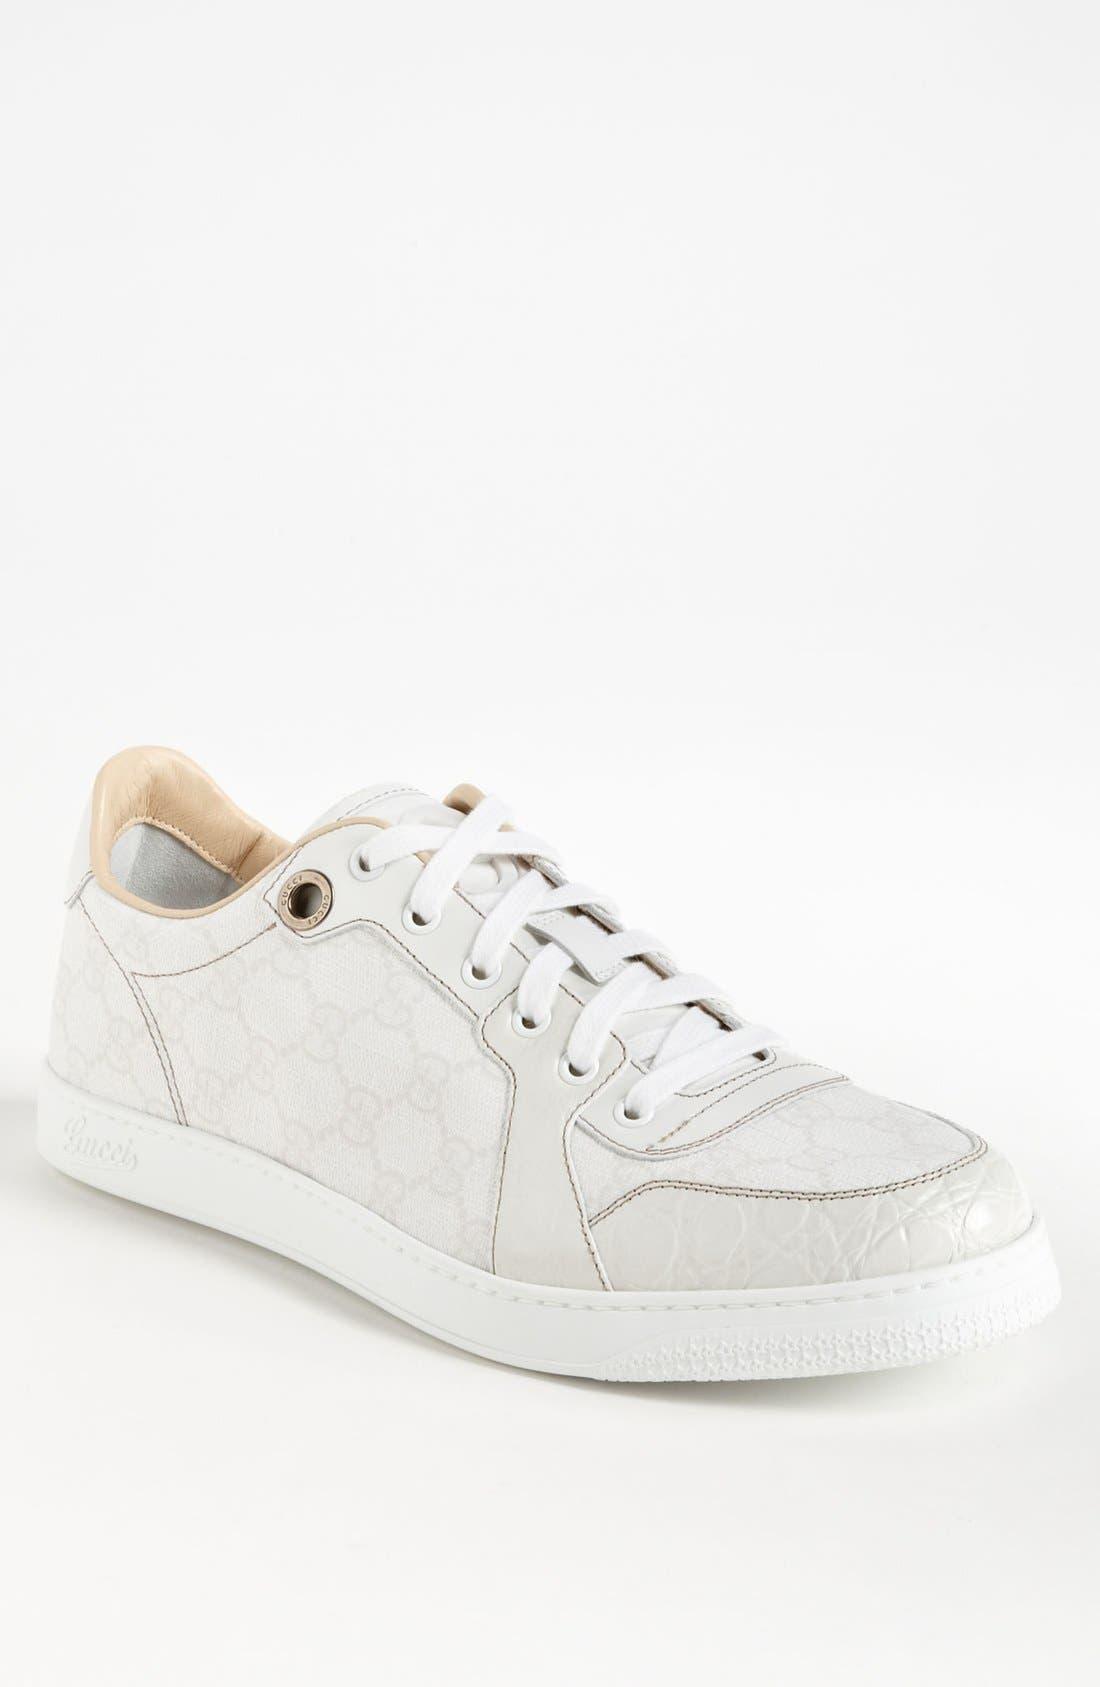 Alternate Image 1 Selected - Gucci 'Coda Low' Sneaker